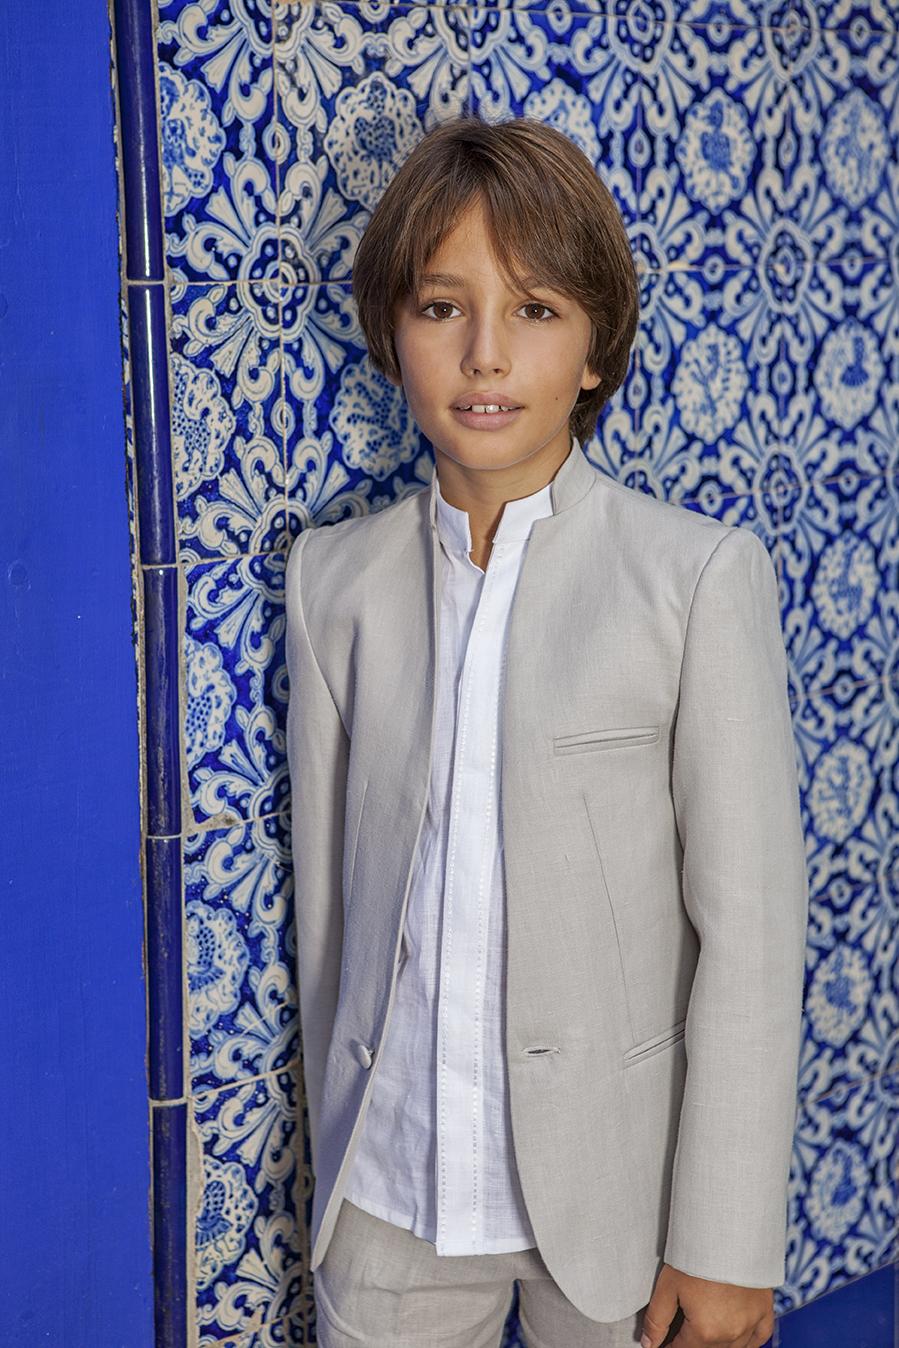 1d8747ca0 Trajes Comunion niño lino Manuel Pardo Moda Masculina